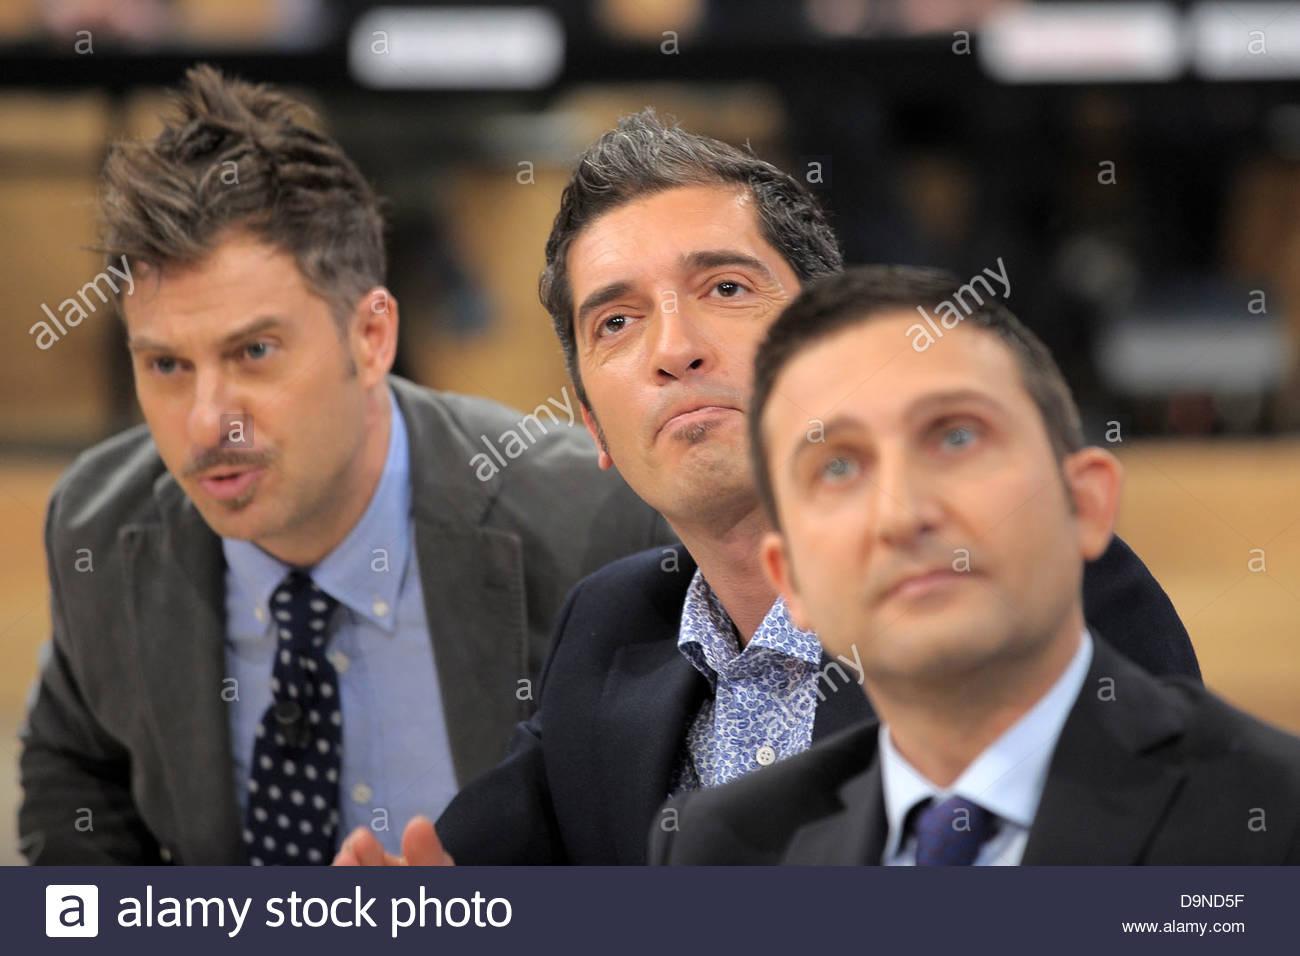 trio medusa - Stock Image